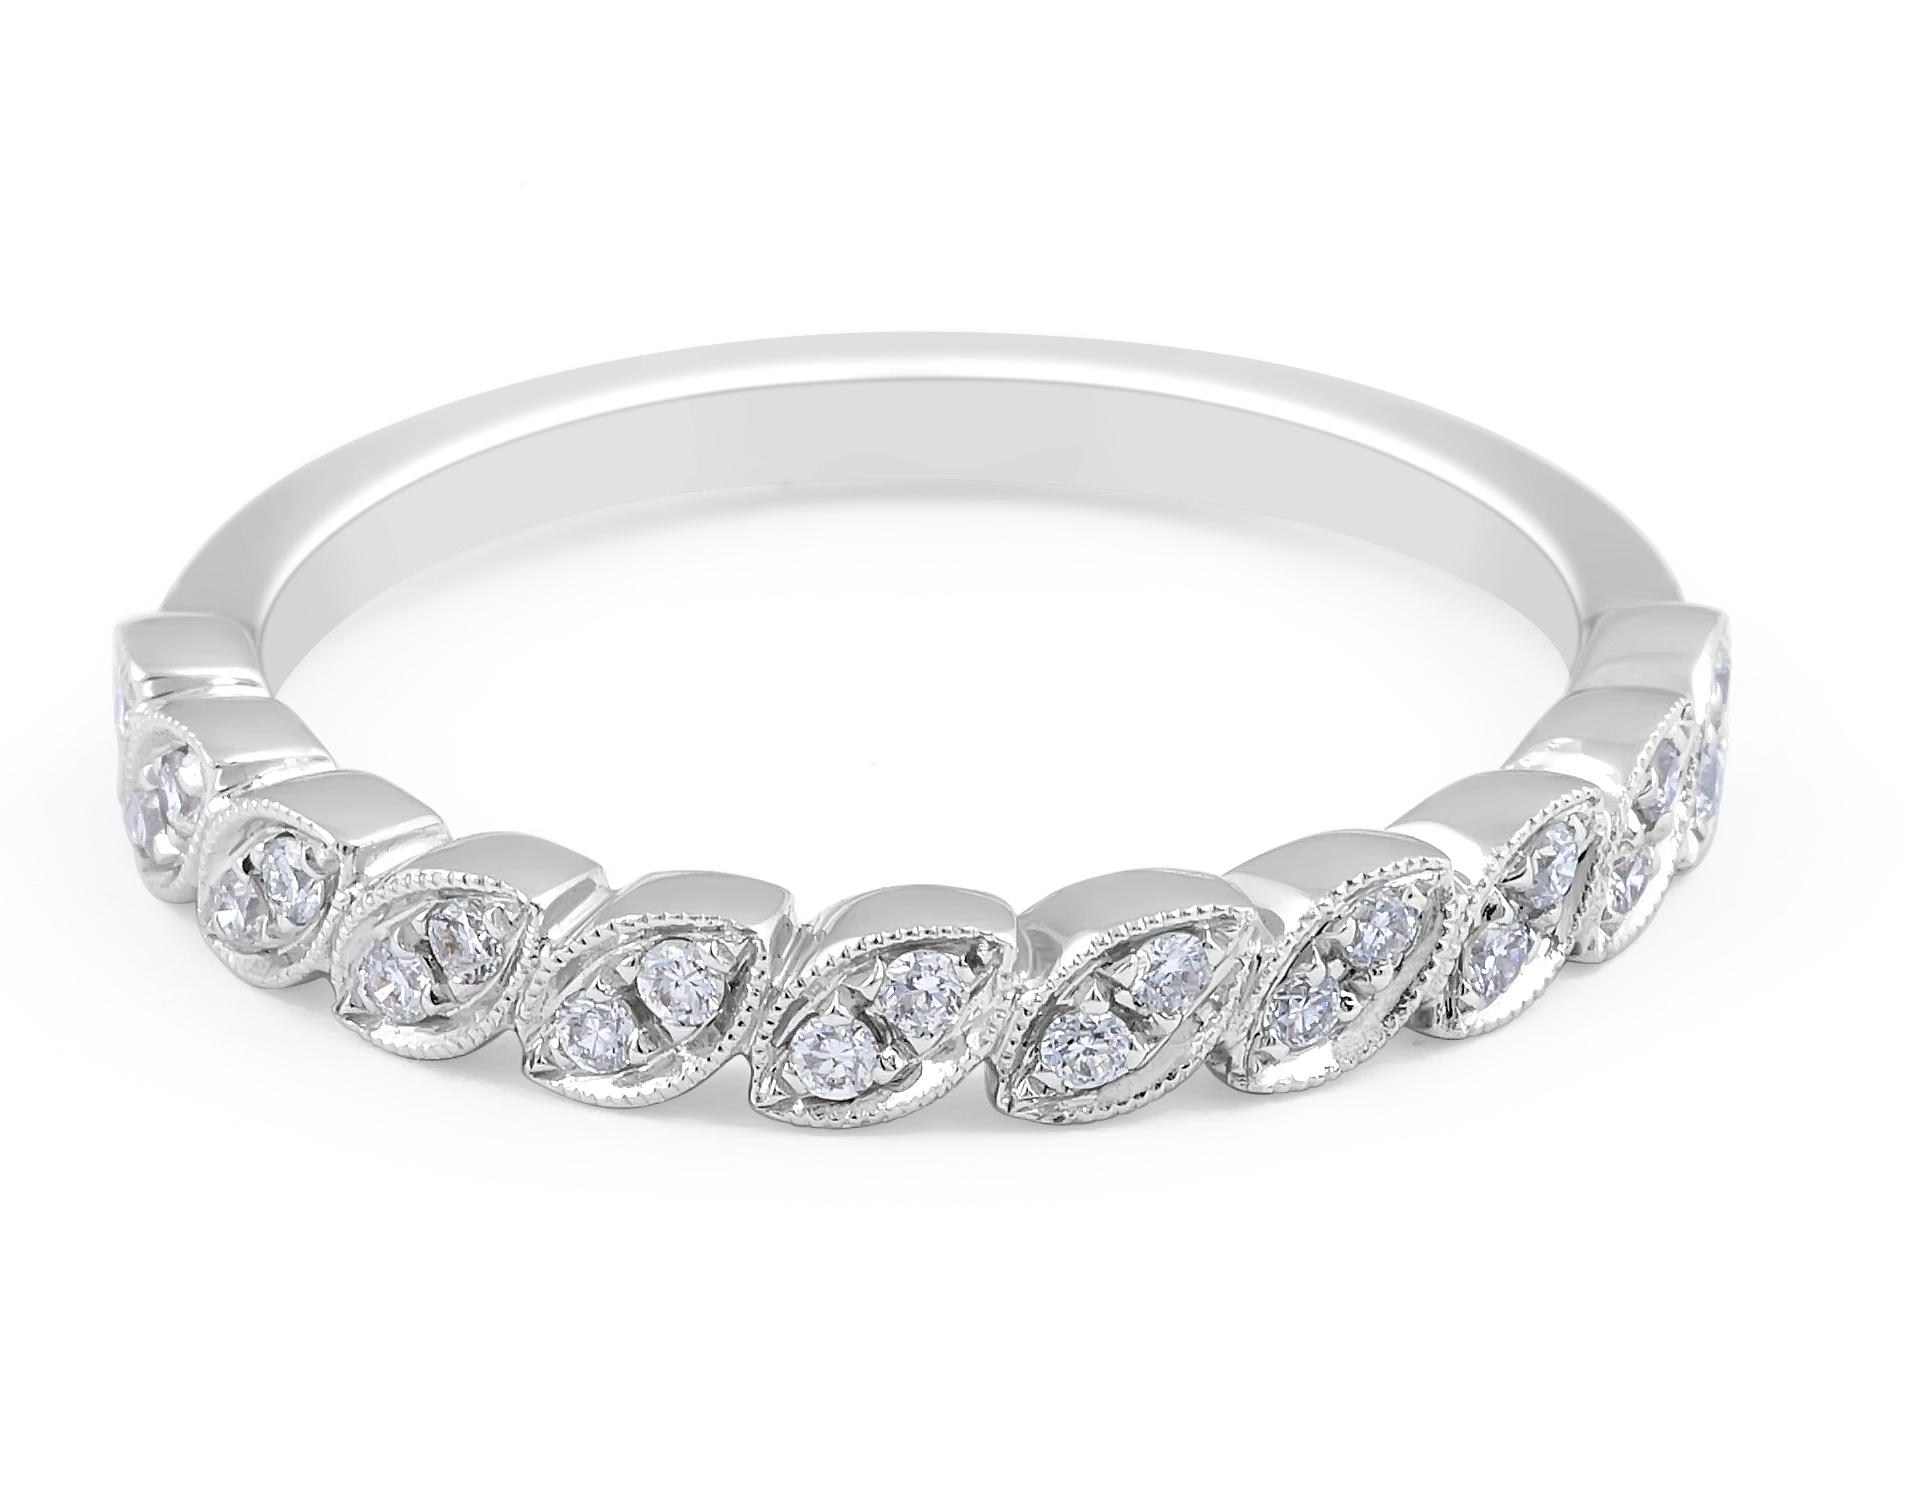 18 Karat White Gold Vintage Diamond Wedding Band - womens wedding band